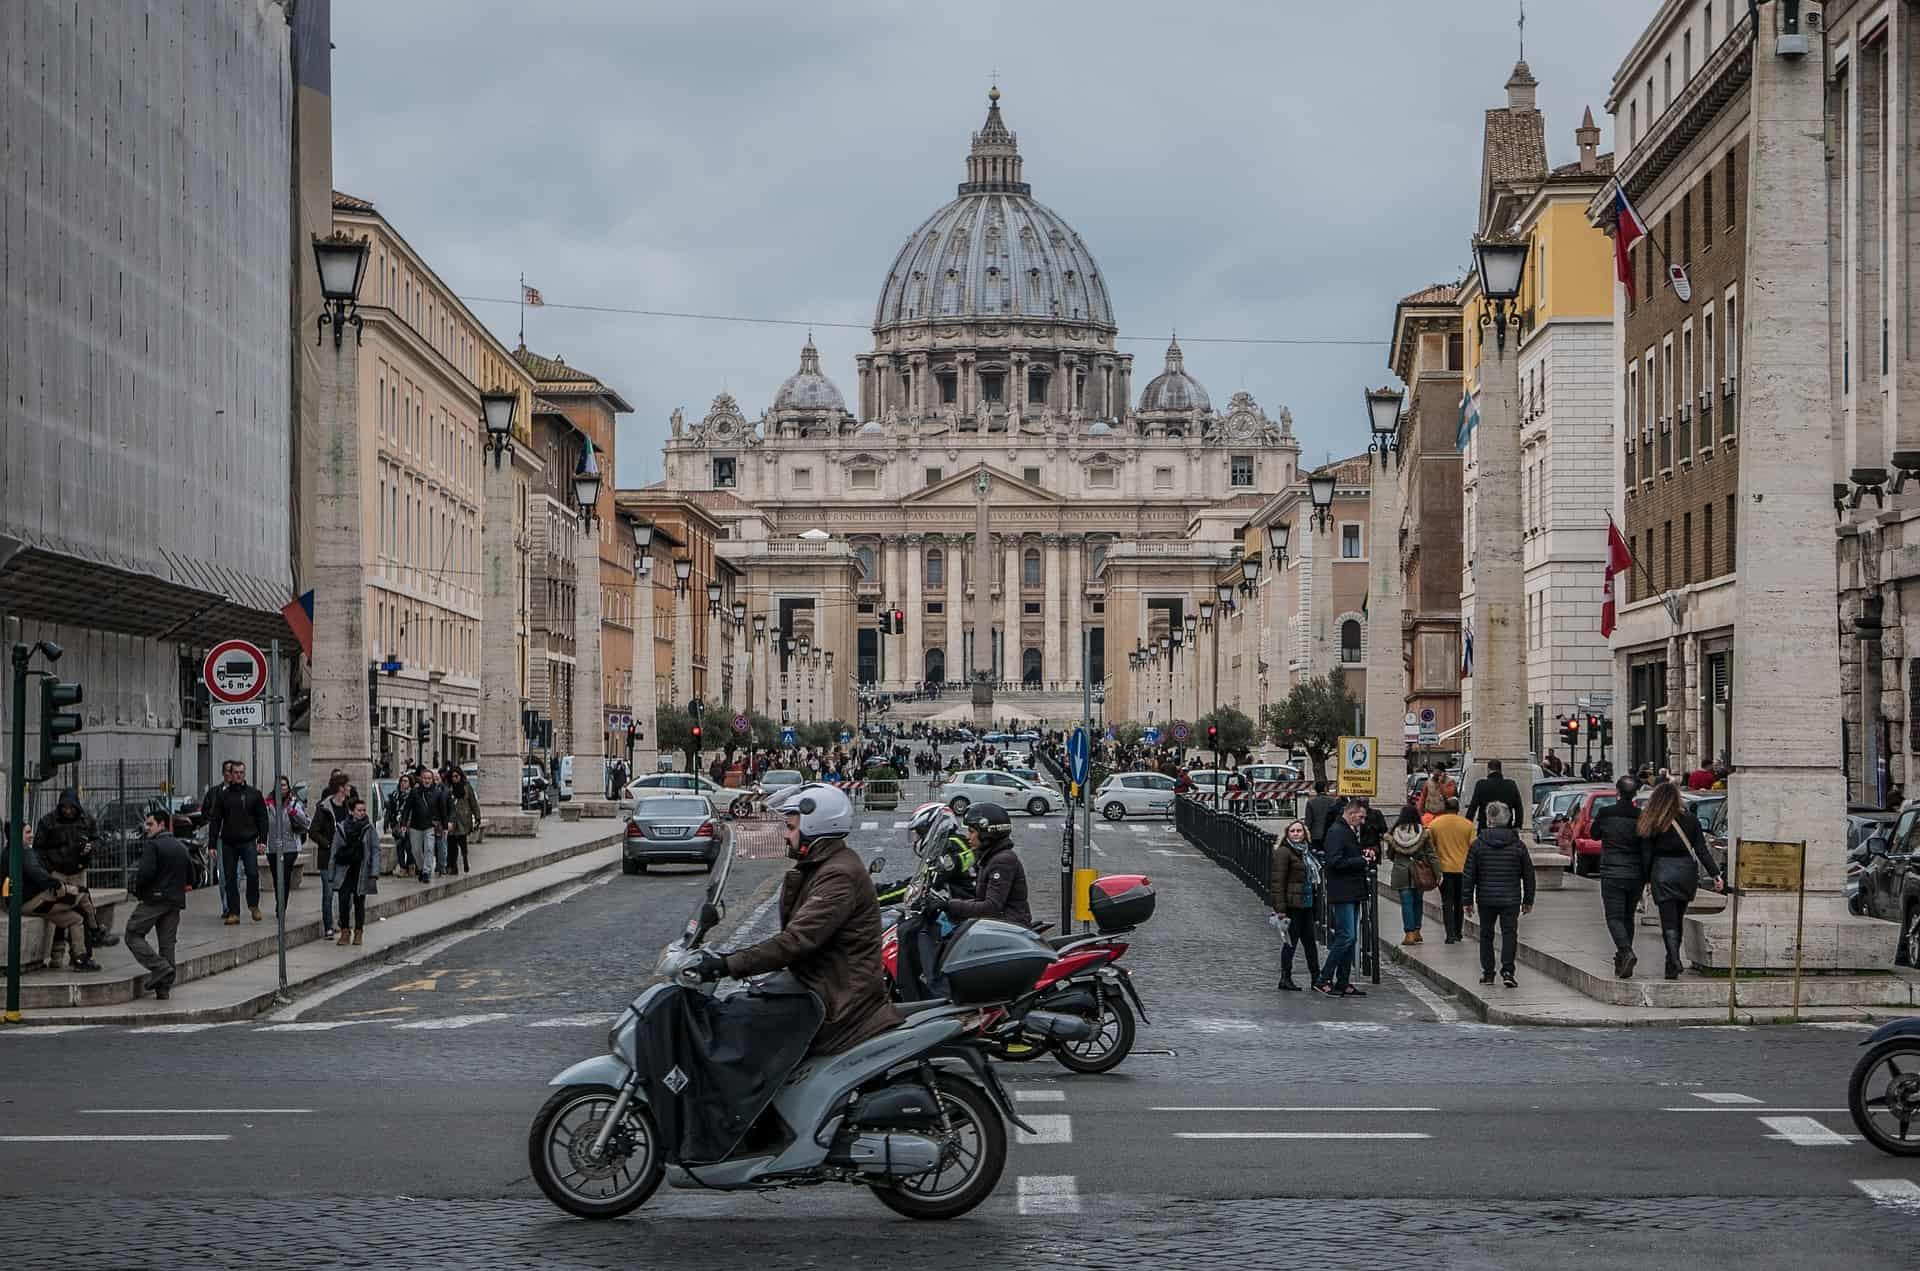 sint-pieter-basiliek-vaticaan-rome